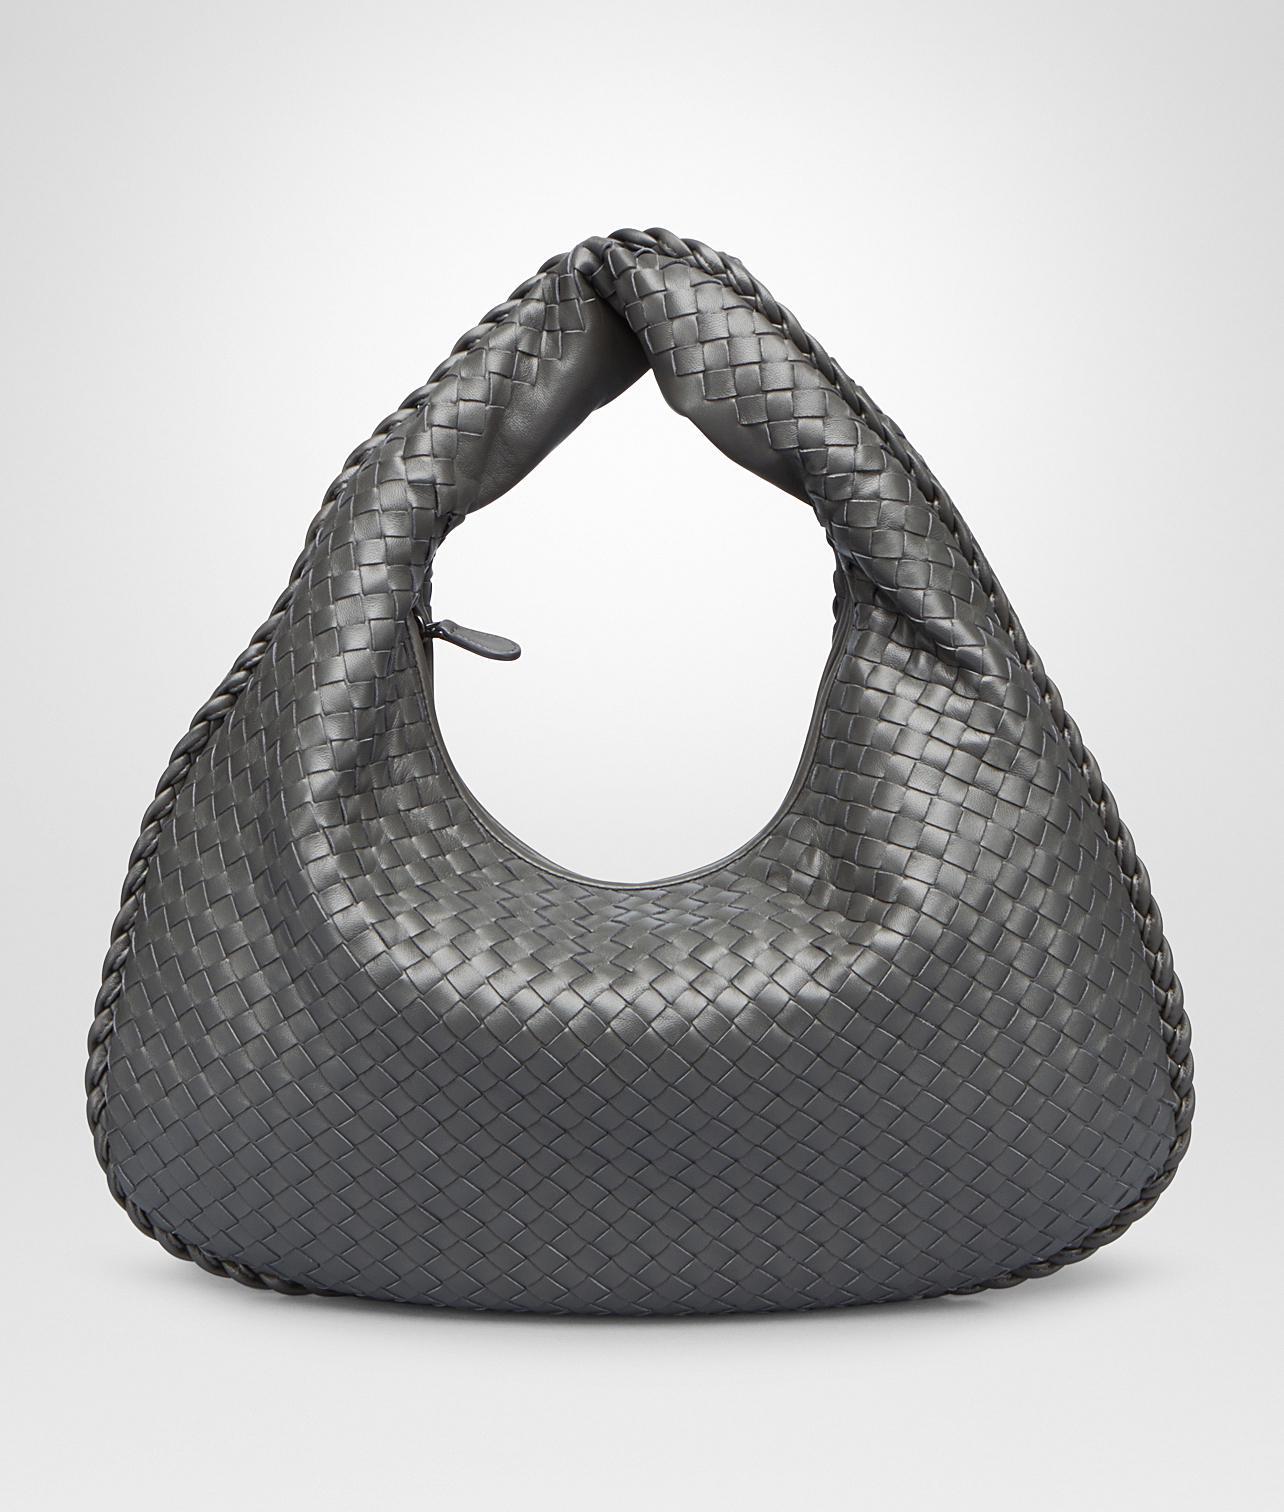 3d6bcf5efde5 Lyst - Bottega Veneta Light Gray Intrecciato Nappa Large Veneta Bag ...